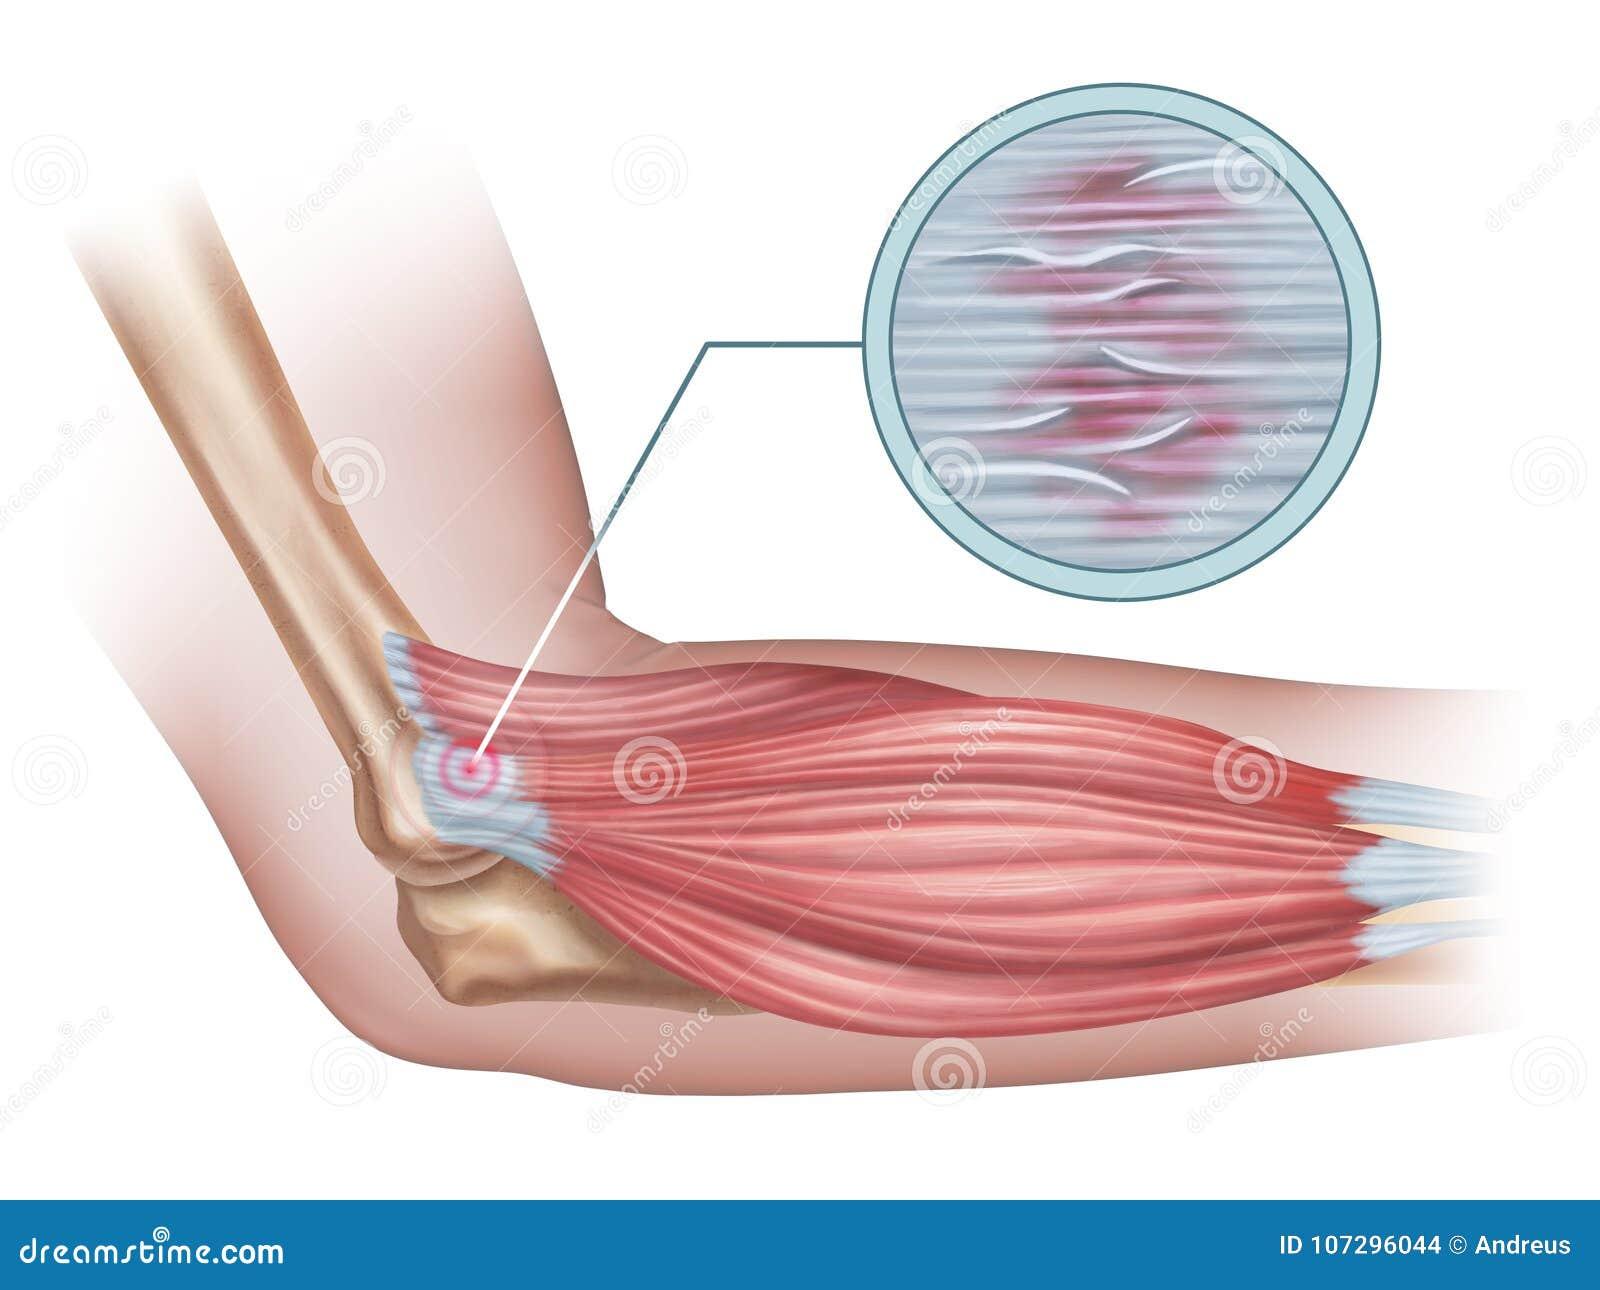 Lateral epicondylitis stock illustration. Illustration of injury ...